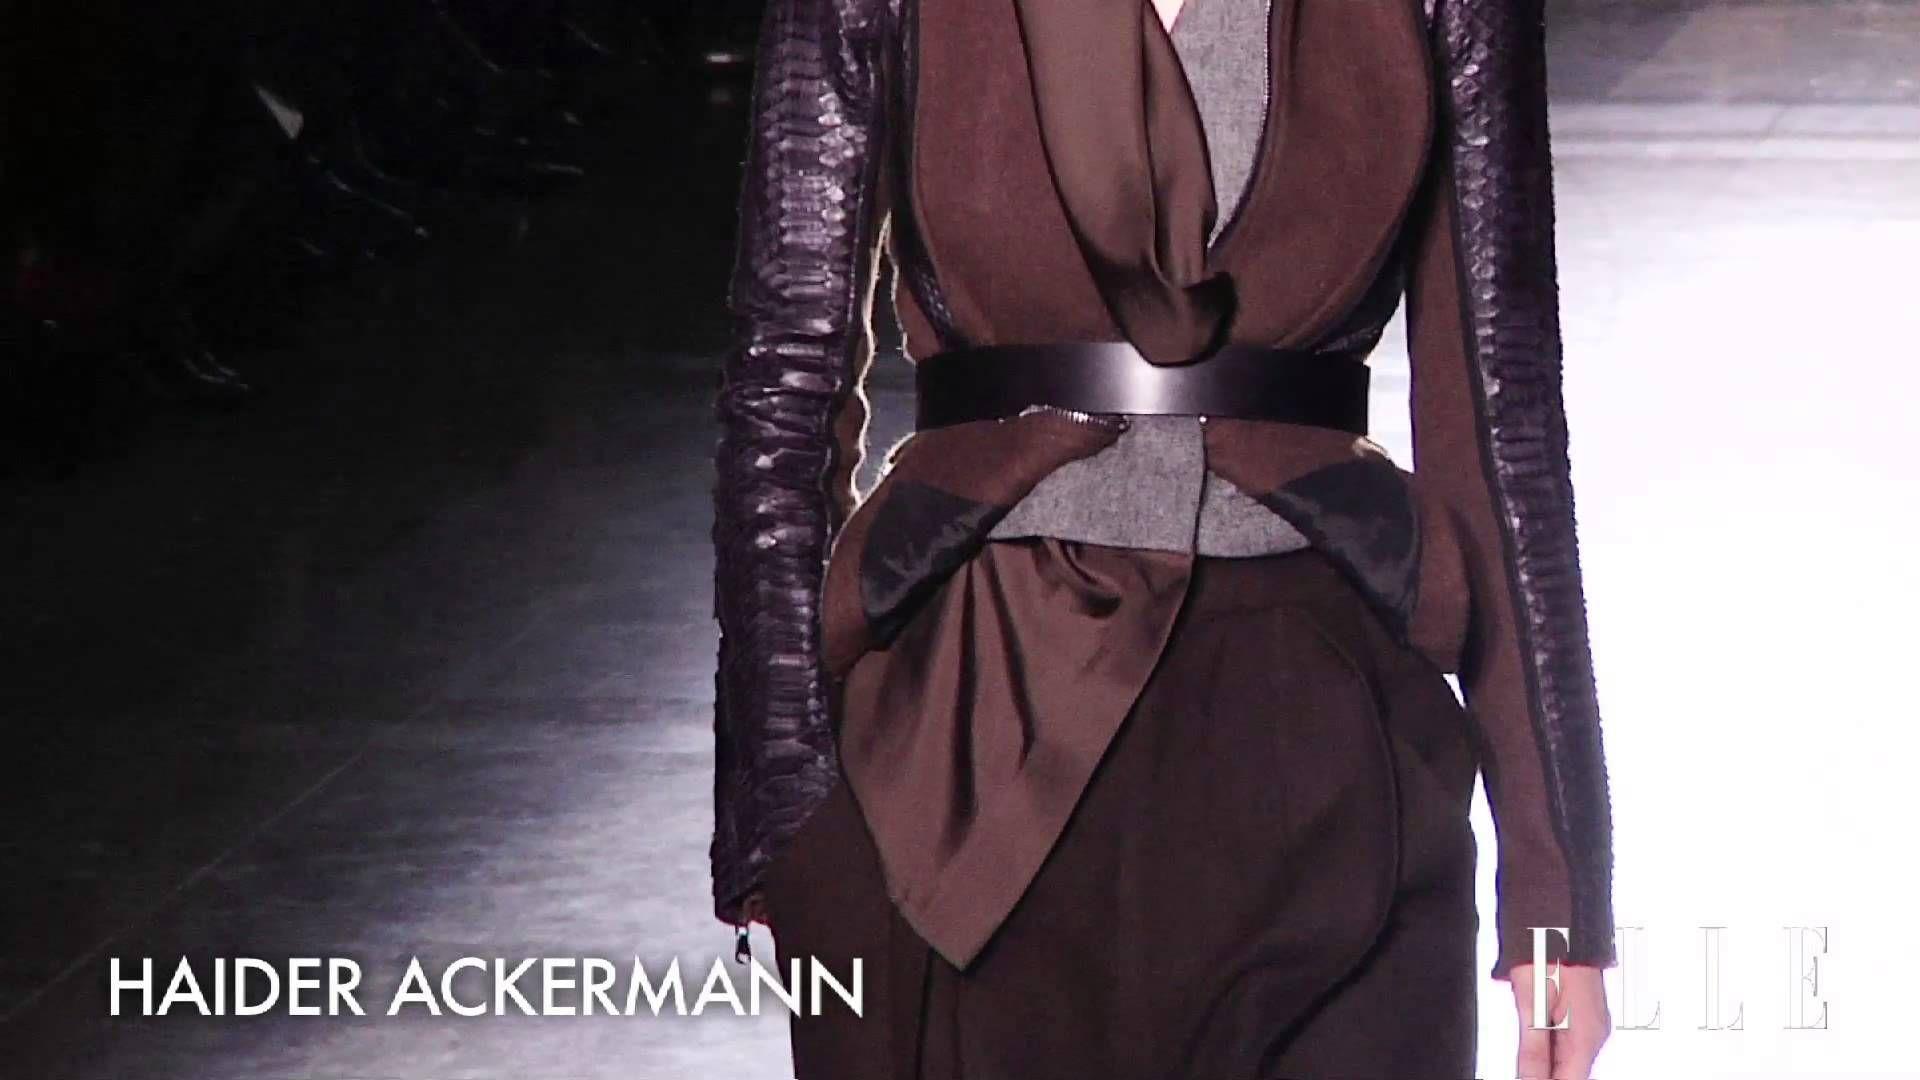 Défilé Haider Ackermann Automne-Hiver 2014-2015 #pfw https://www.youtube.com/watch?v=Ryf-Ikdxqig